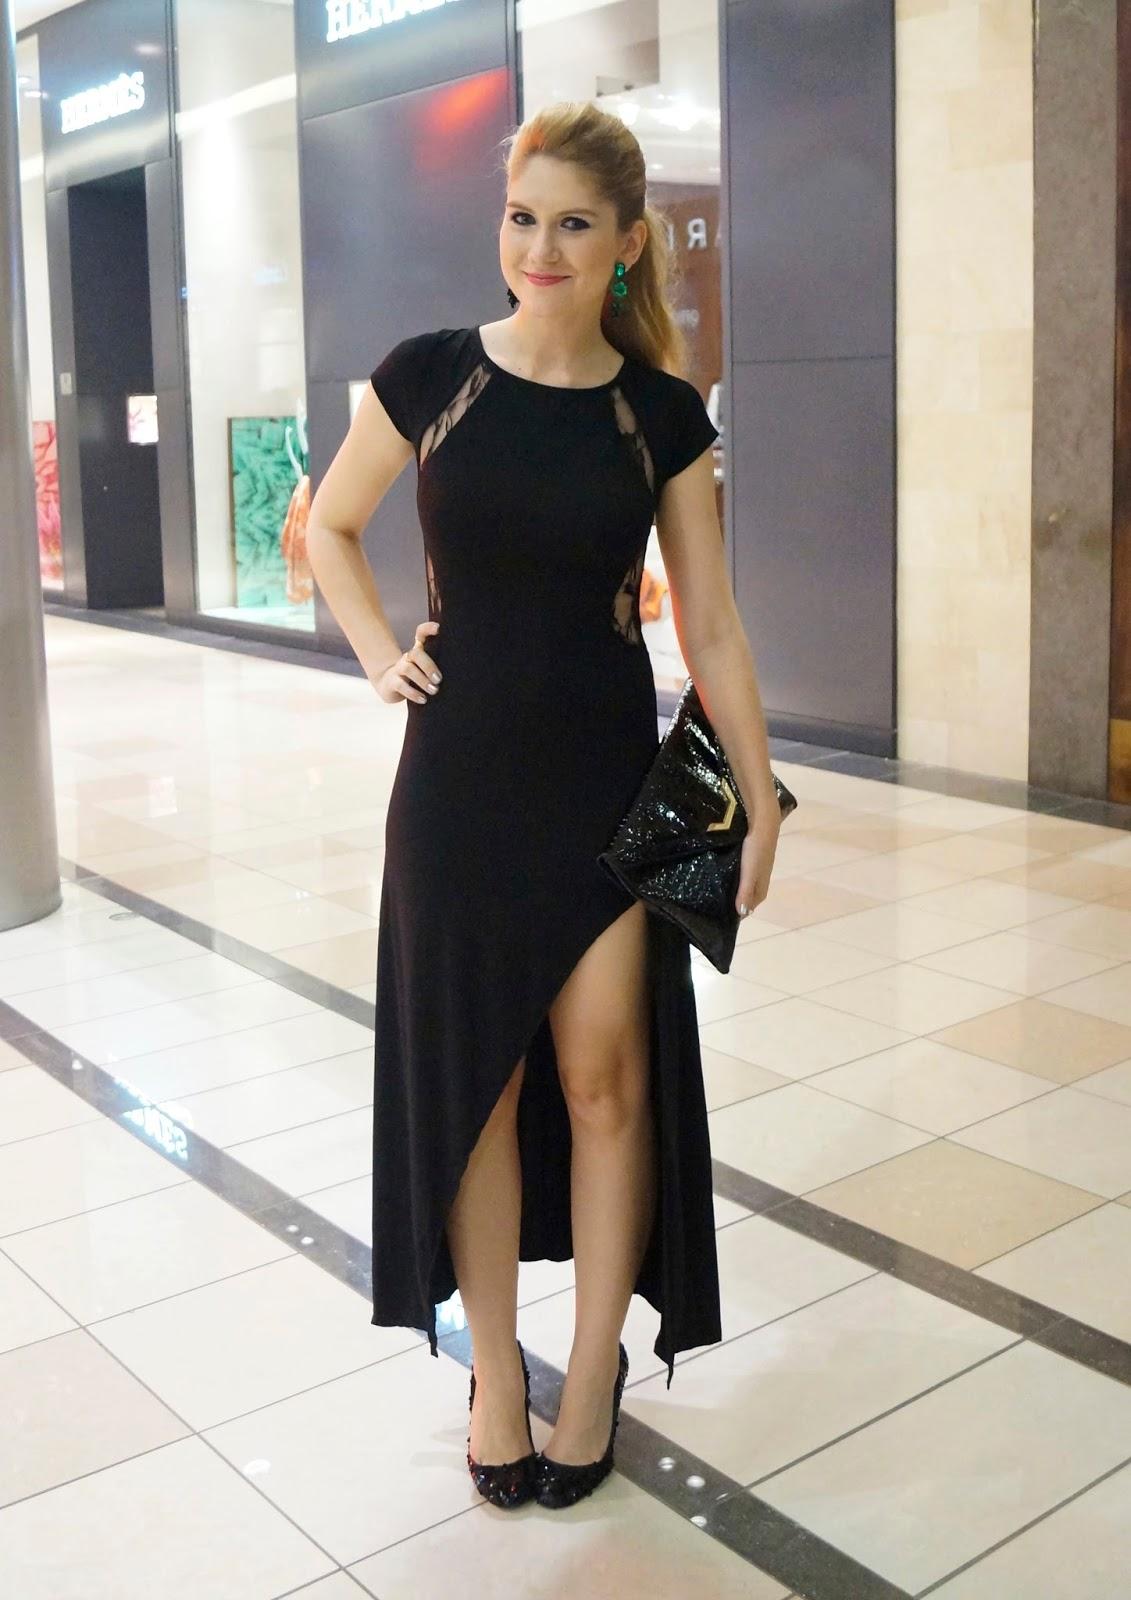 Elegant Black Dress Outfit